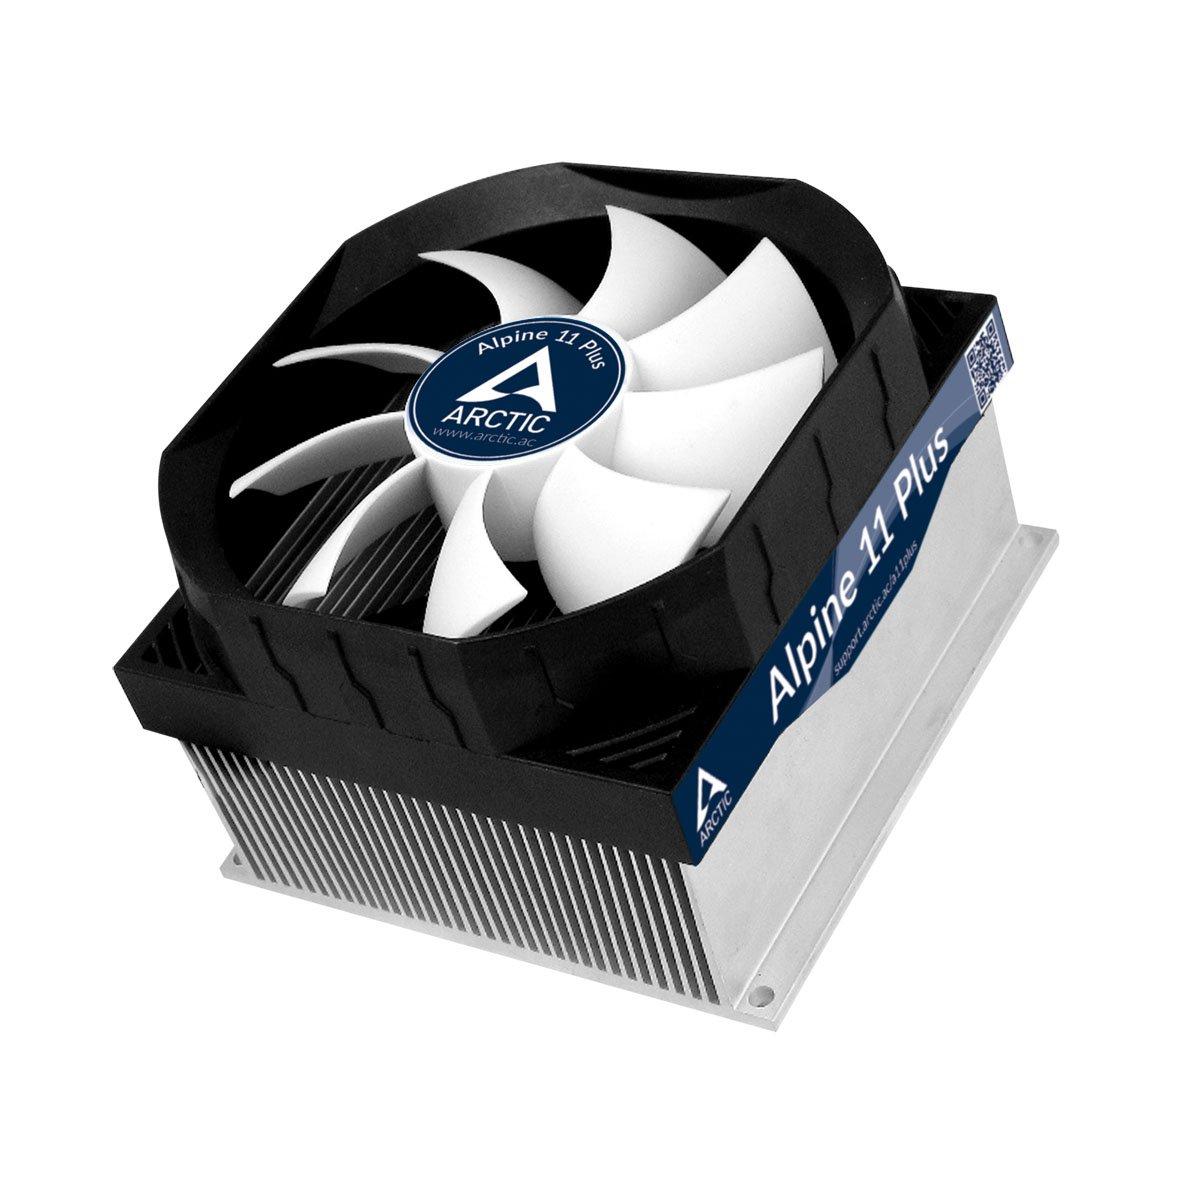 Mac mini 2018 – Thermal management / Cooling solutions – GPU